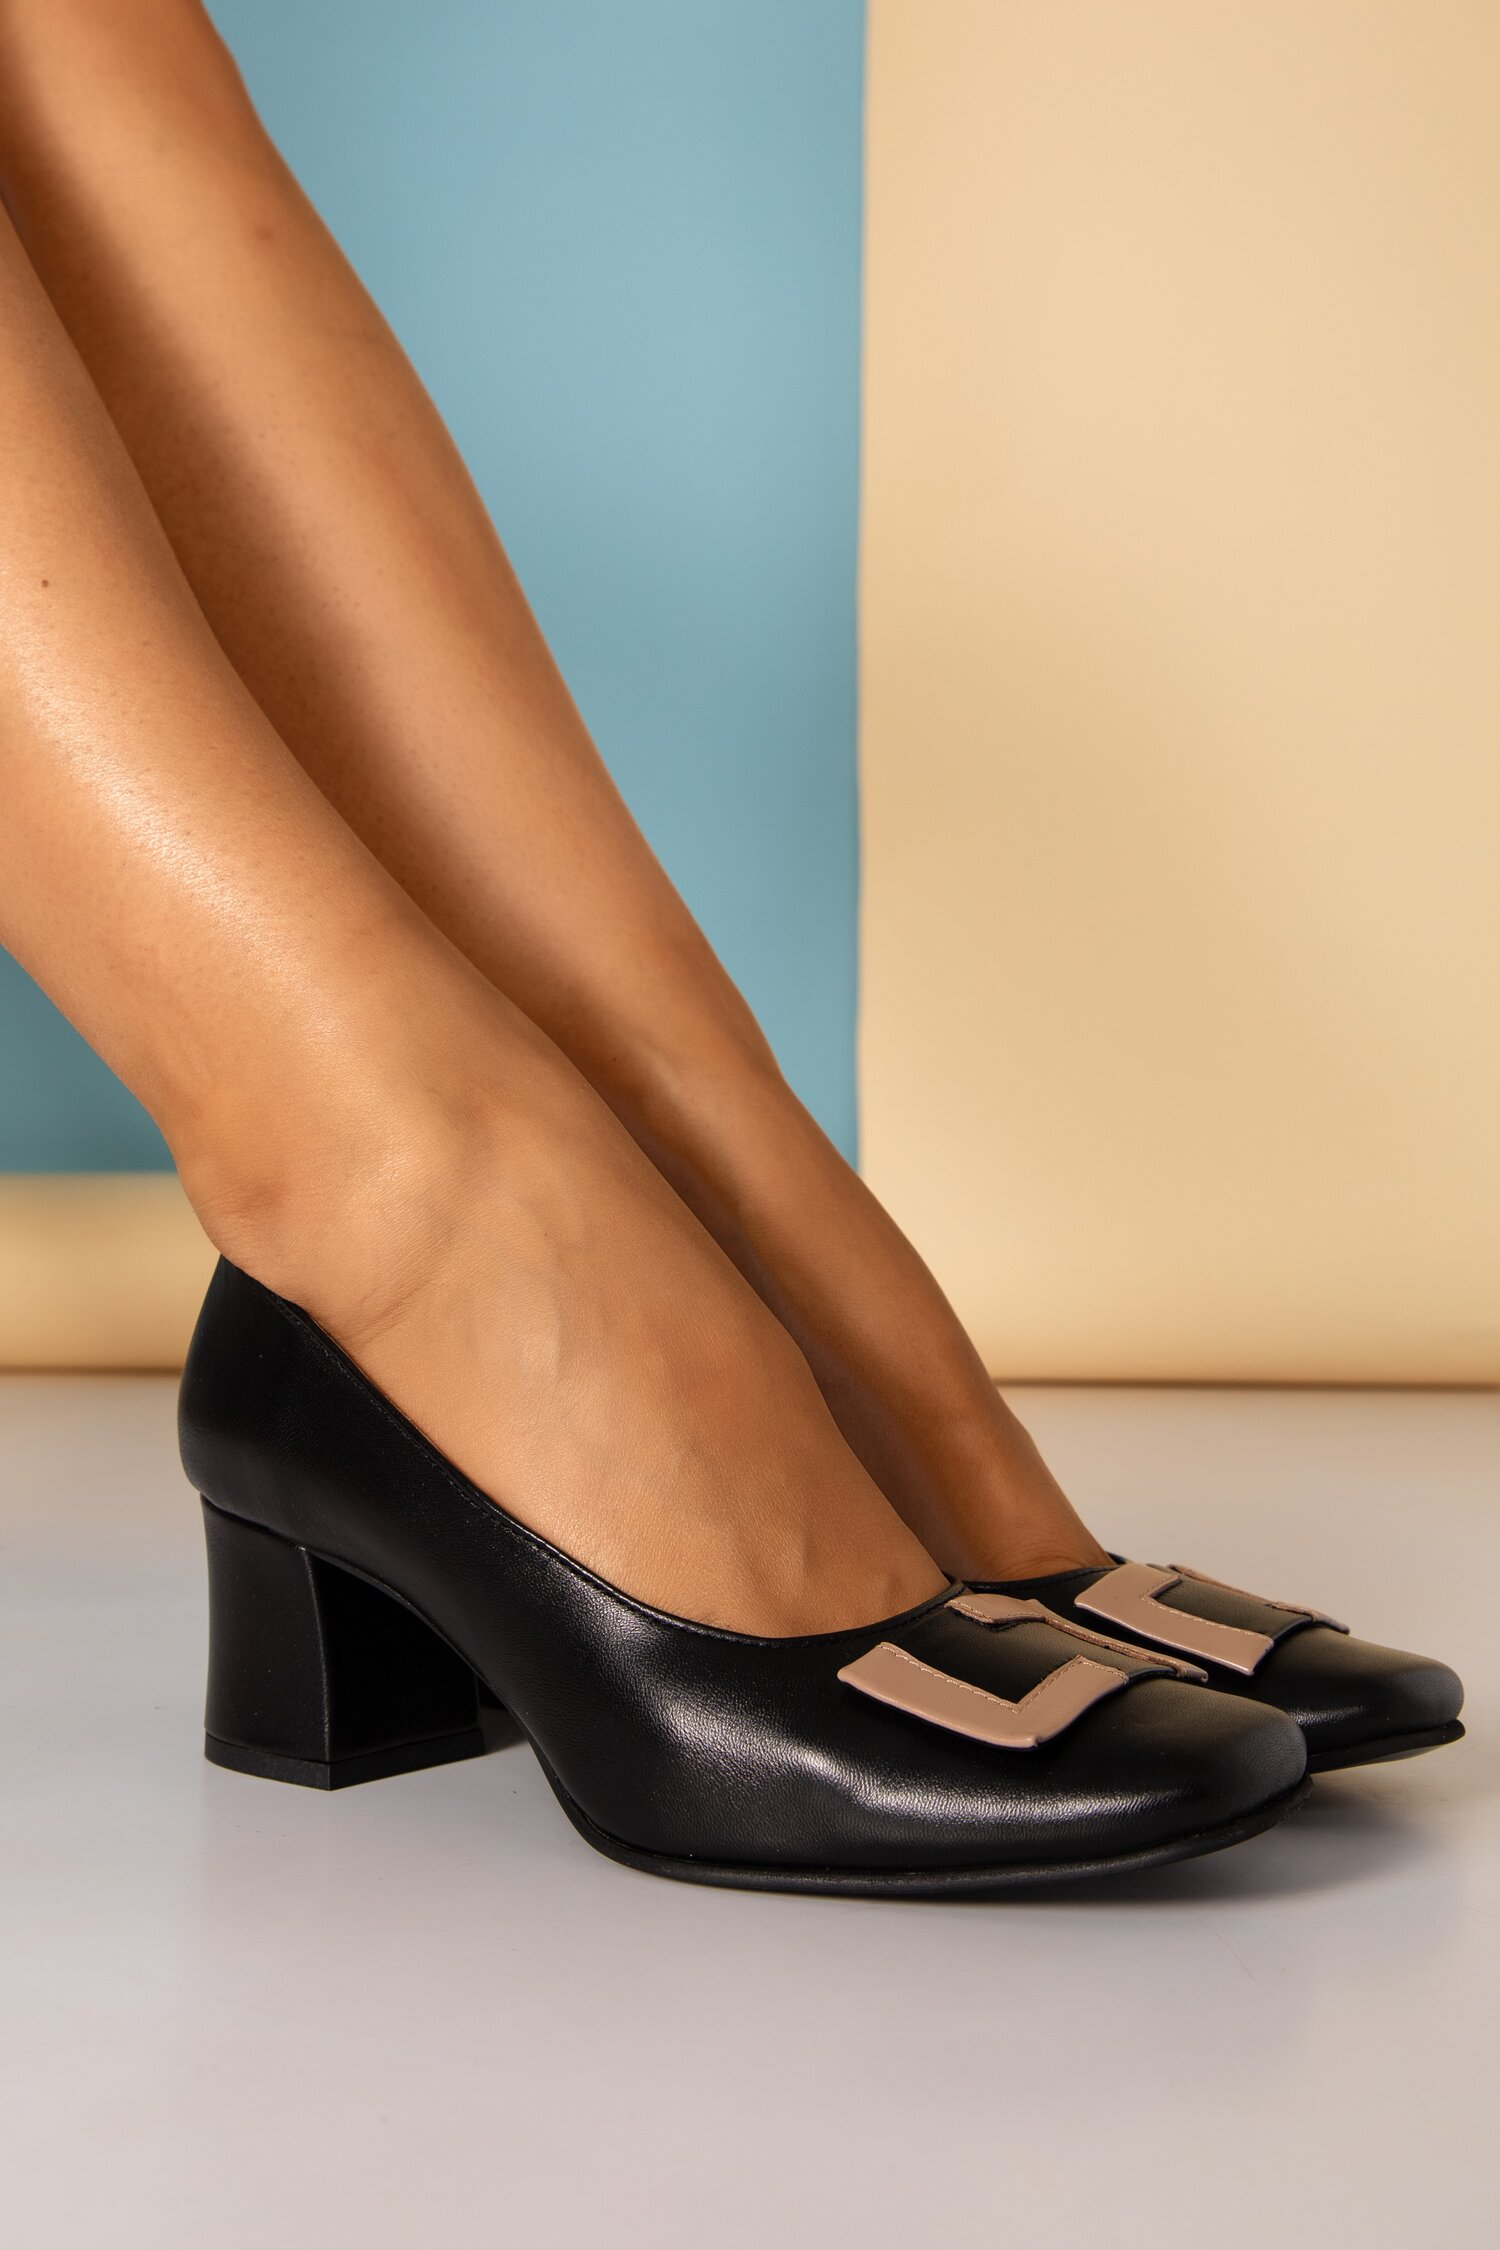 Pantofi Tanya negri cu aplicatie bej pe varf si toc gros imagine